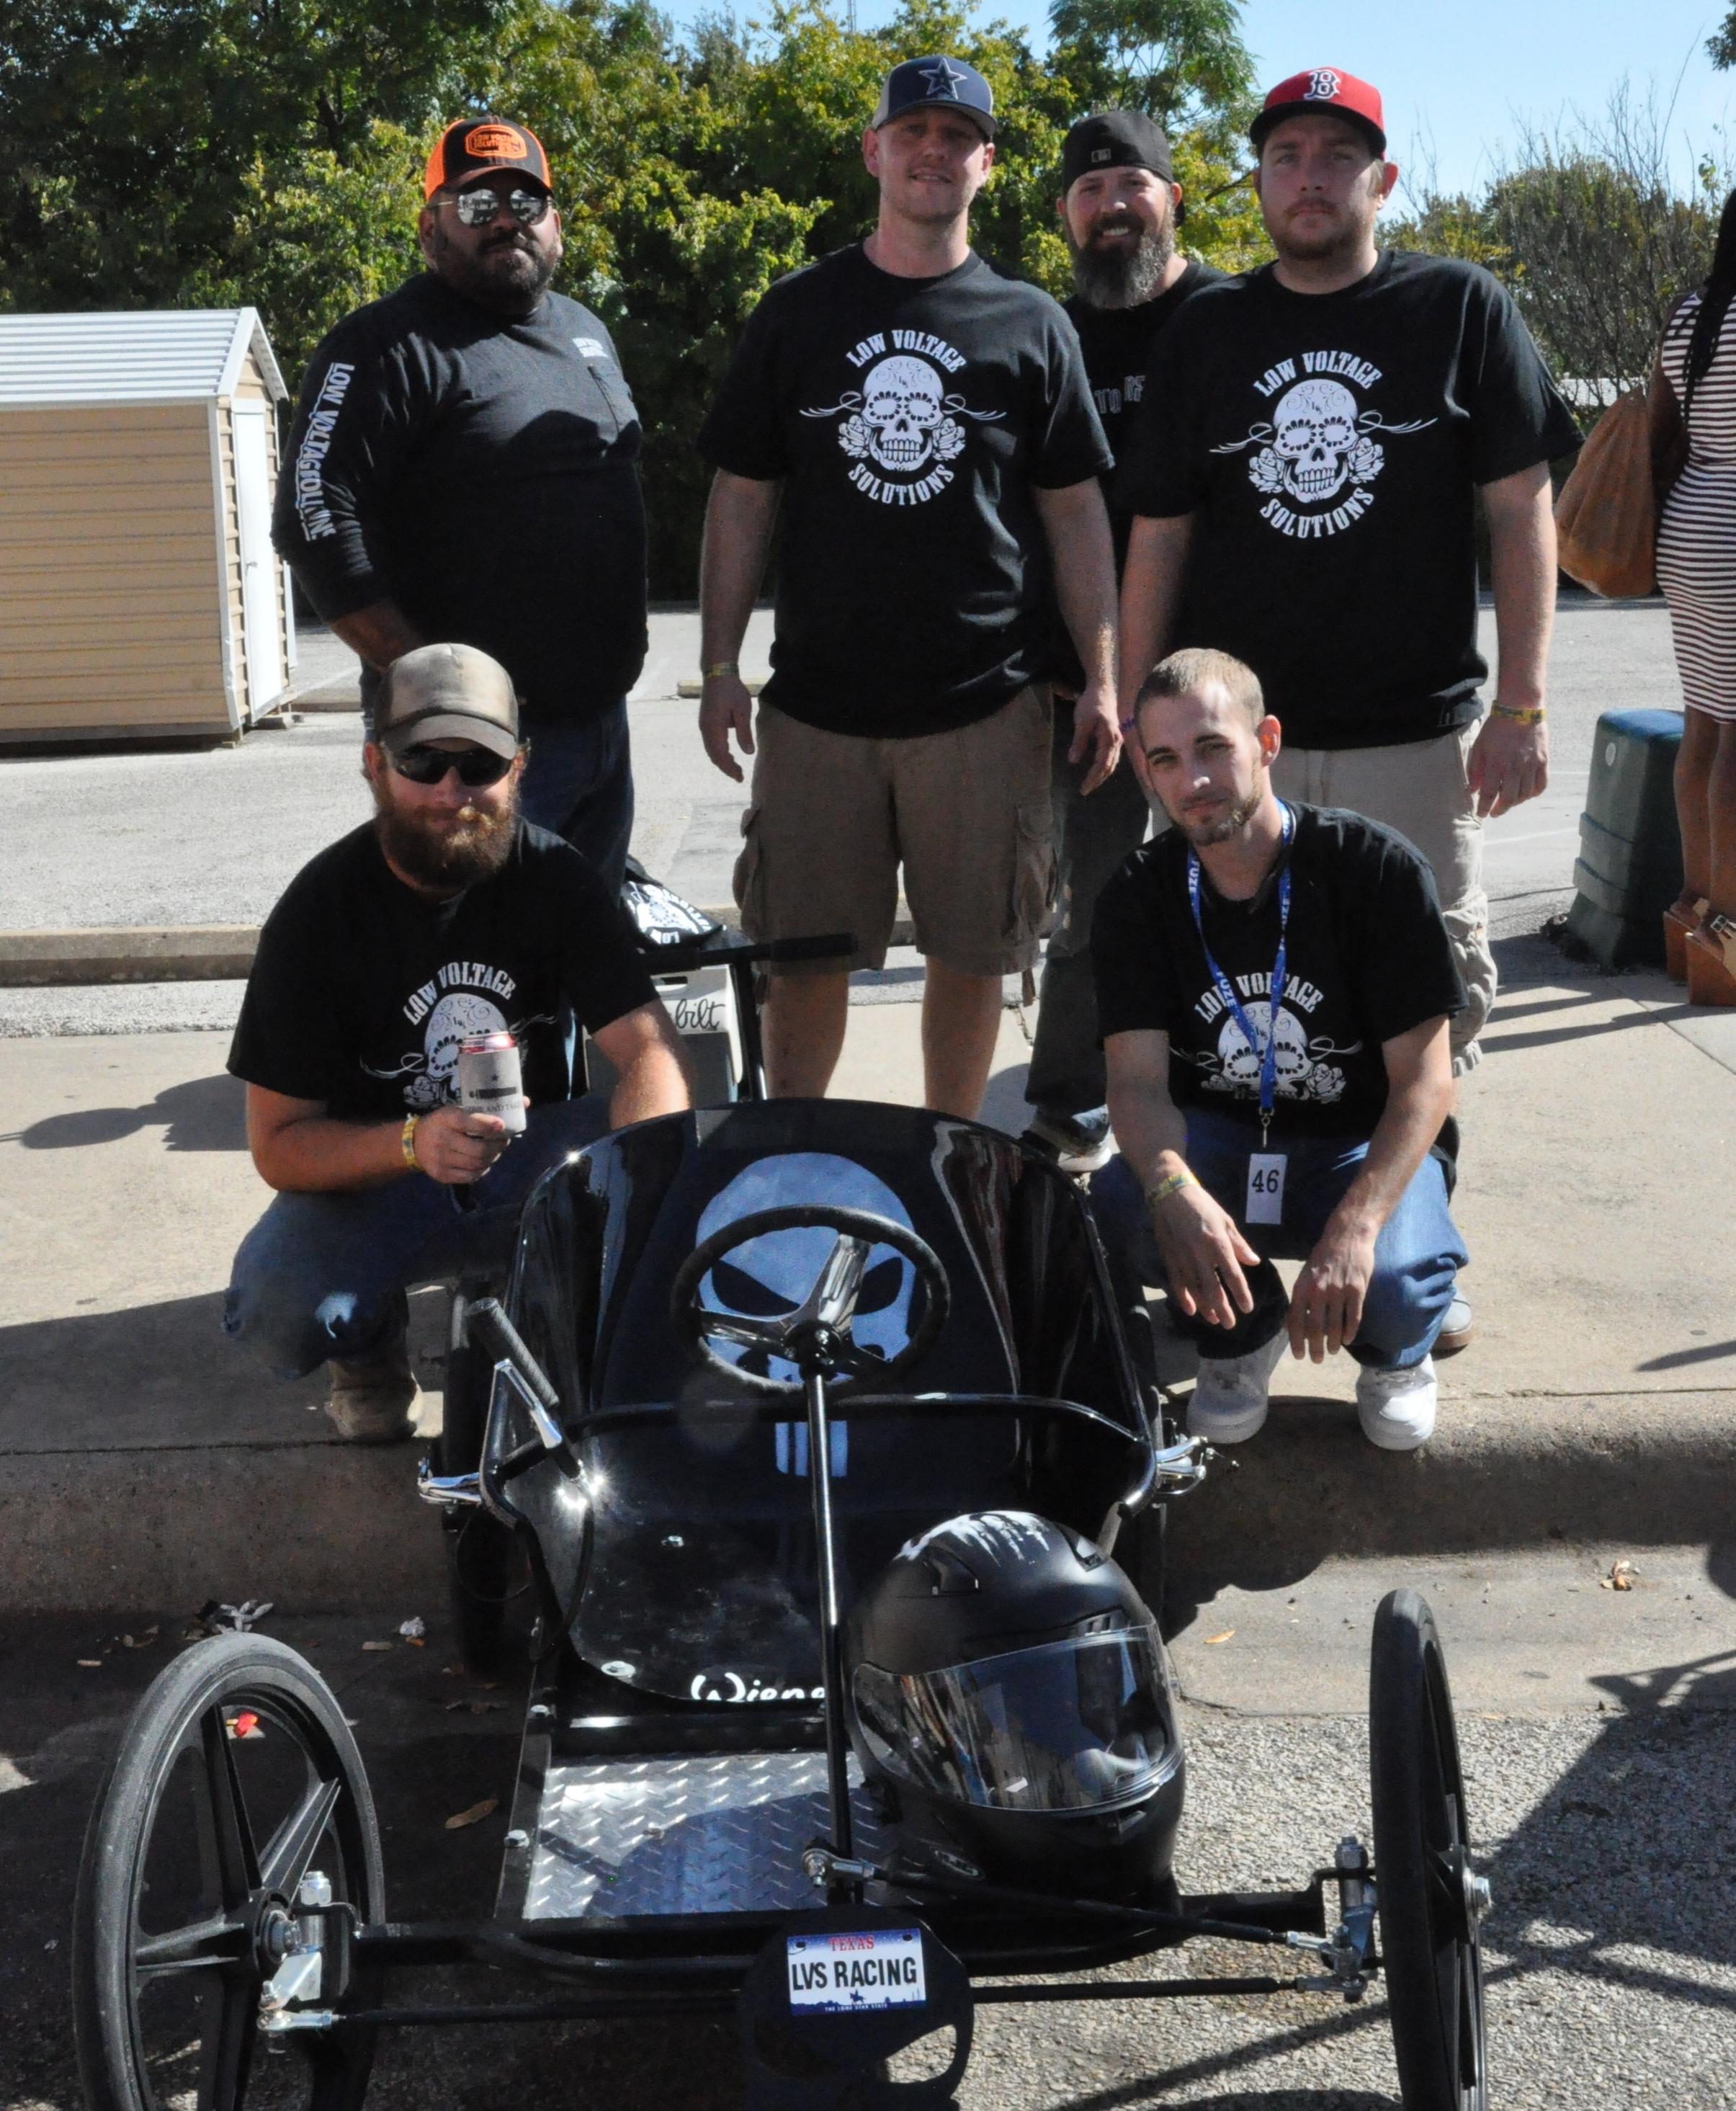 The Punisher (Dallas/Fort Worth Data Center Team)